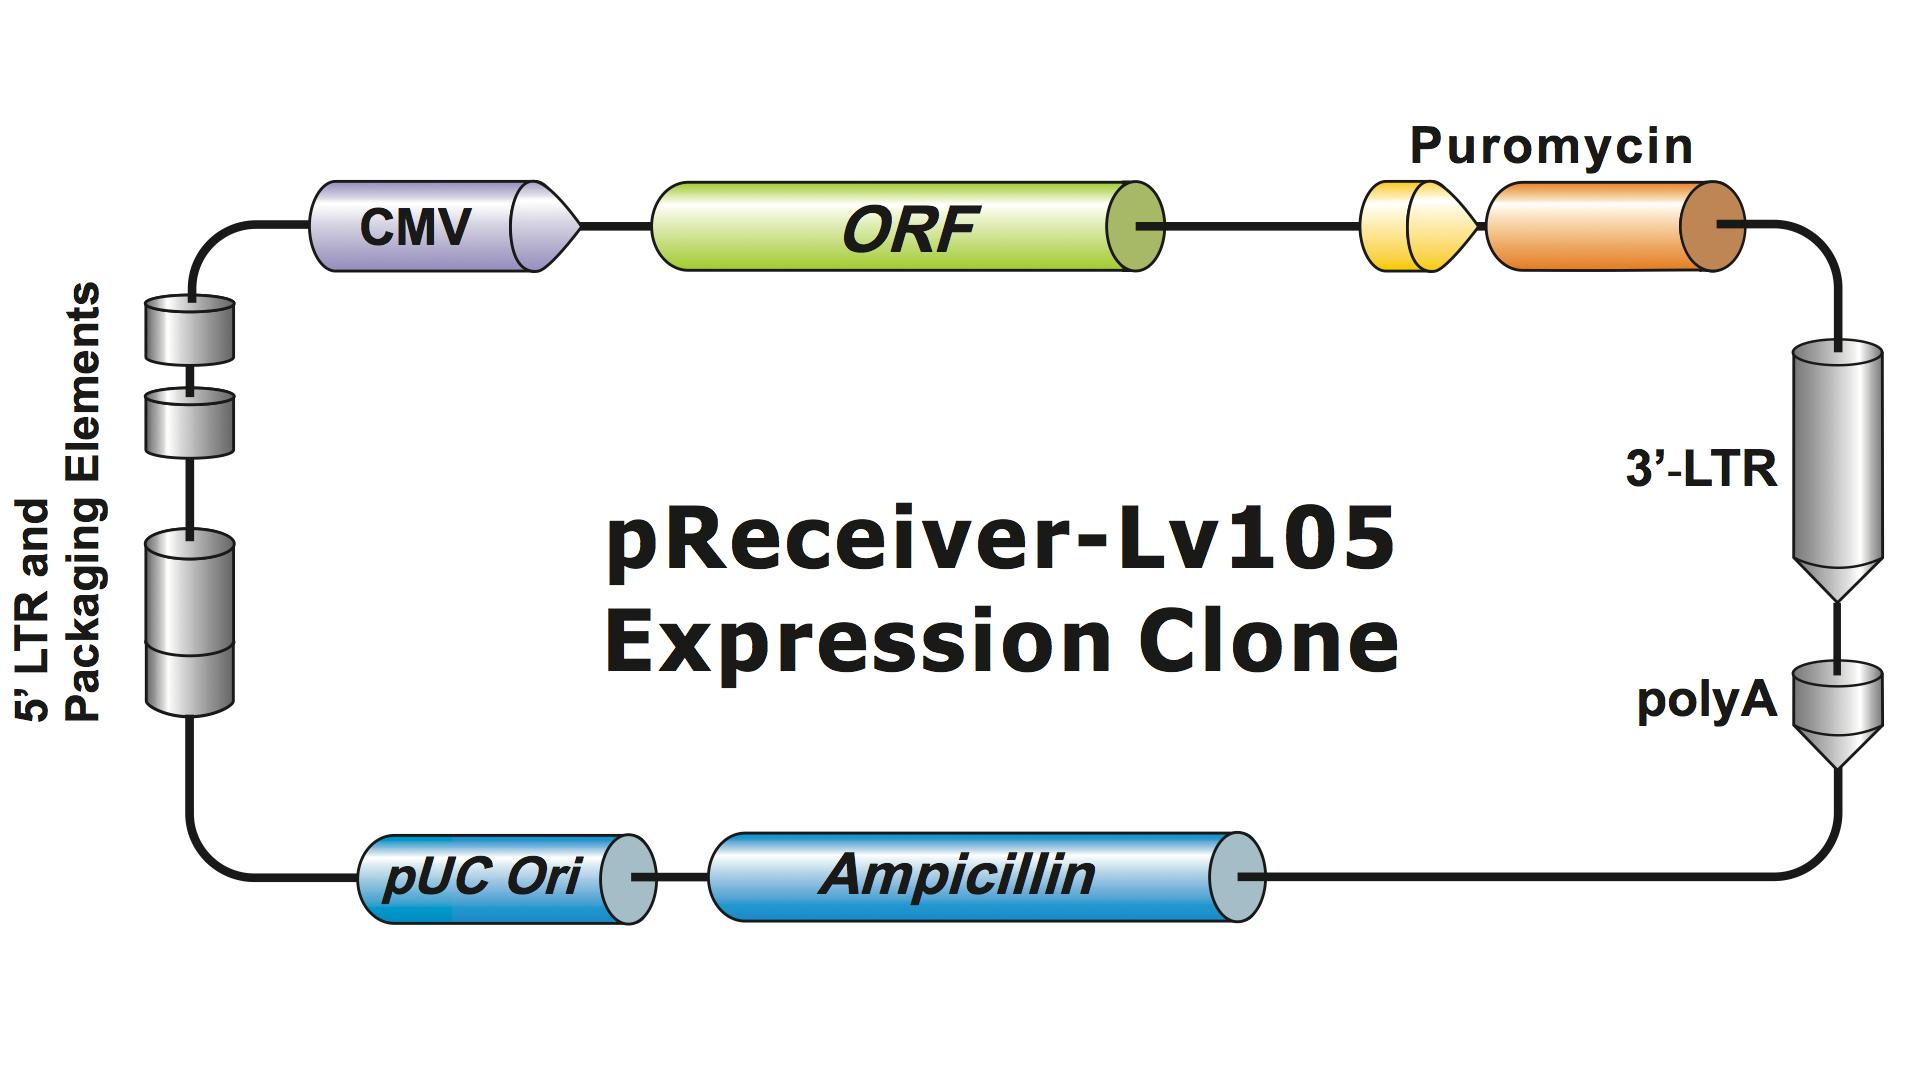 Figure 1 Example Of A GeneCopoeia Lentiviral Expression Clone